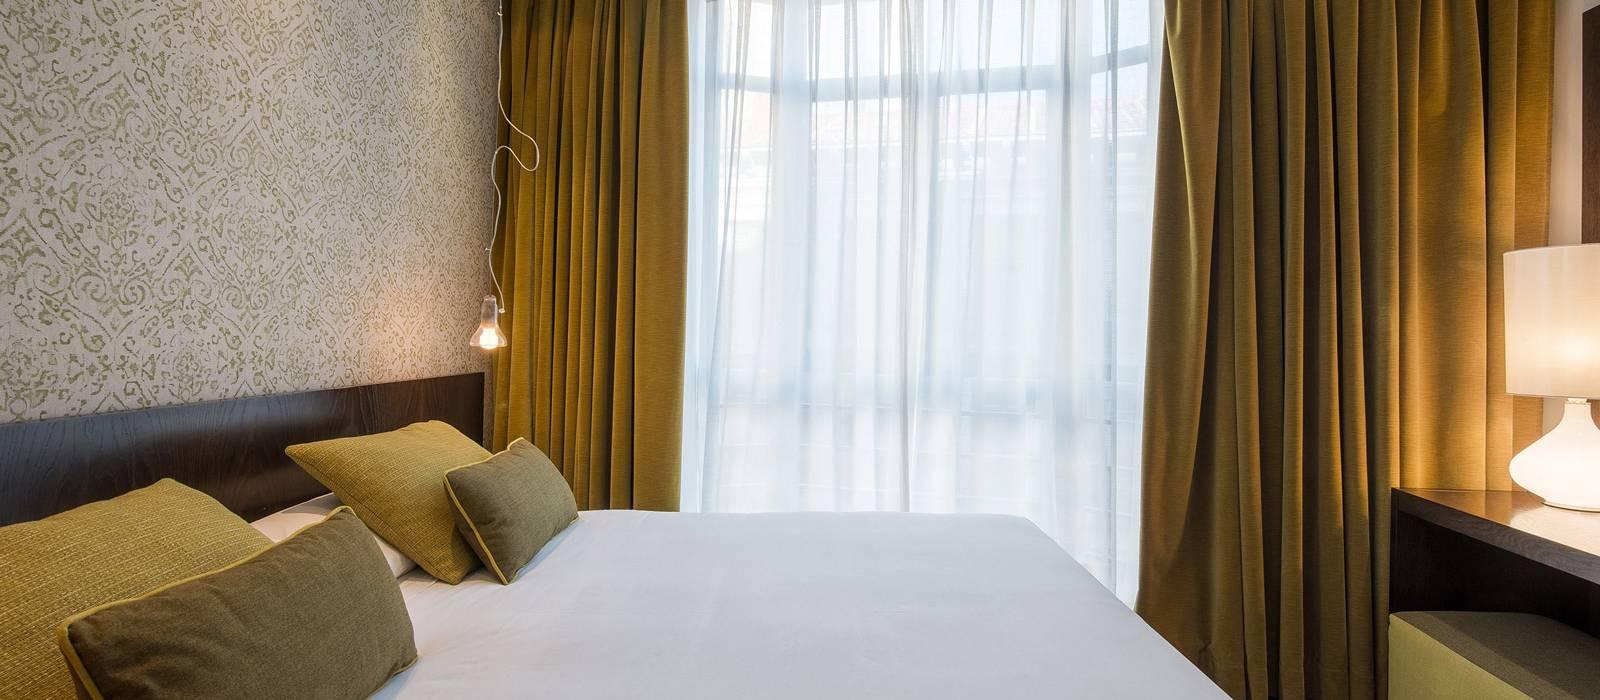 Deluxe Standard Room - Vincci Centrum